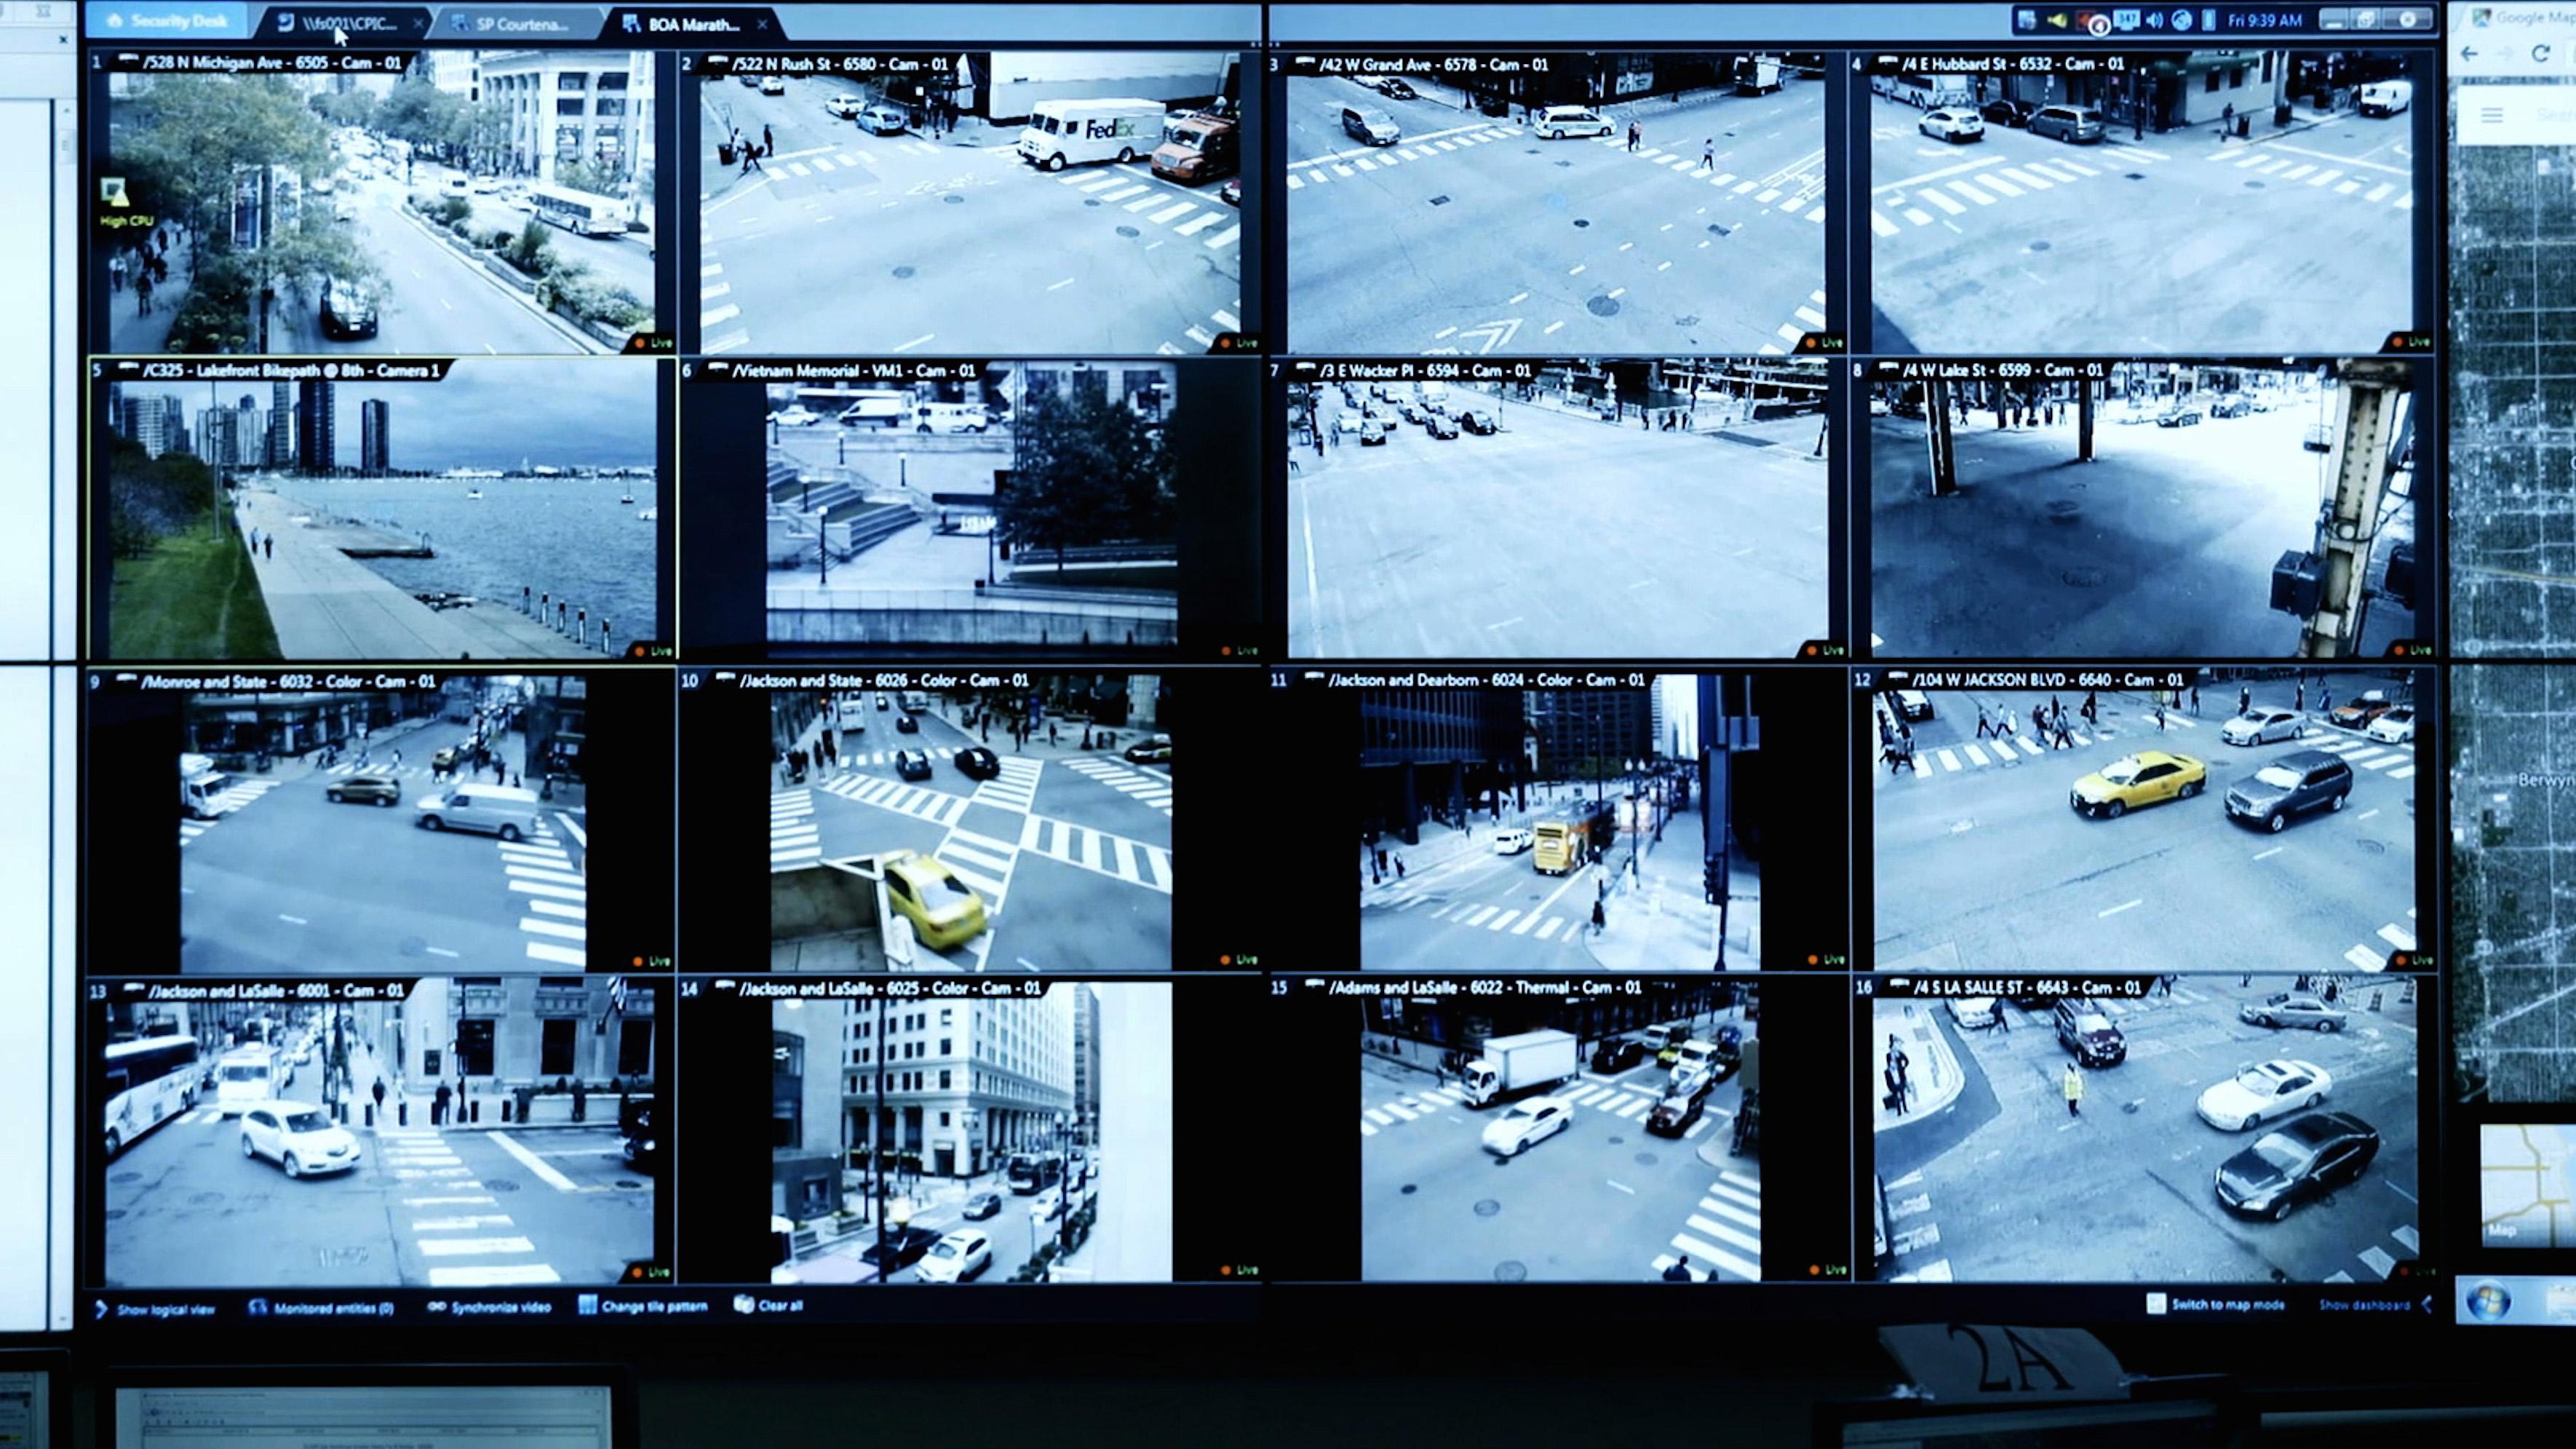 Documentos TV - Pre-crimen - Avance